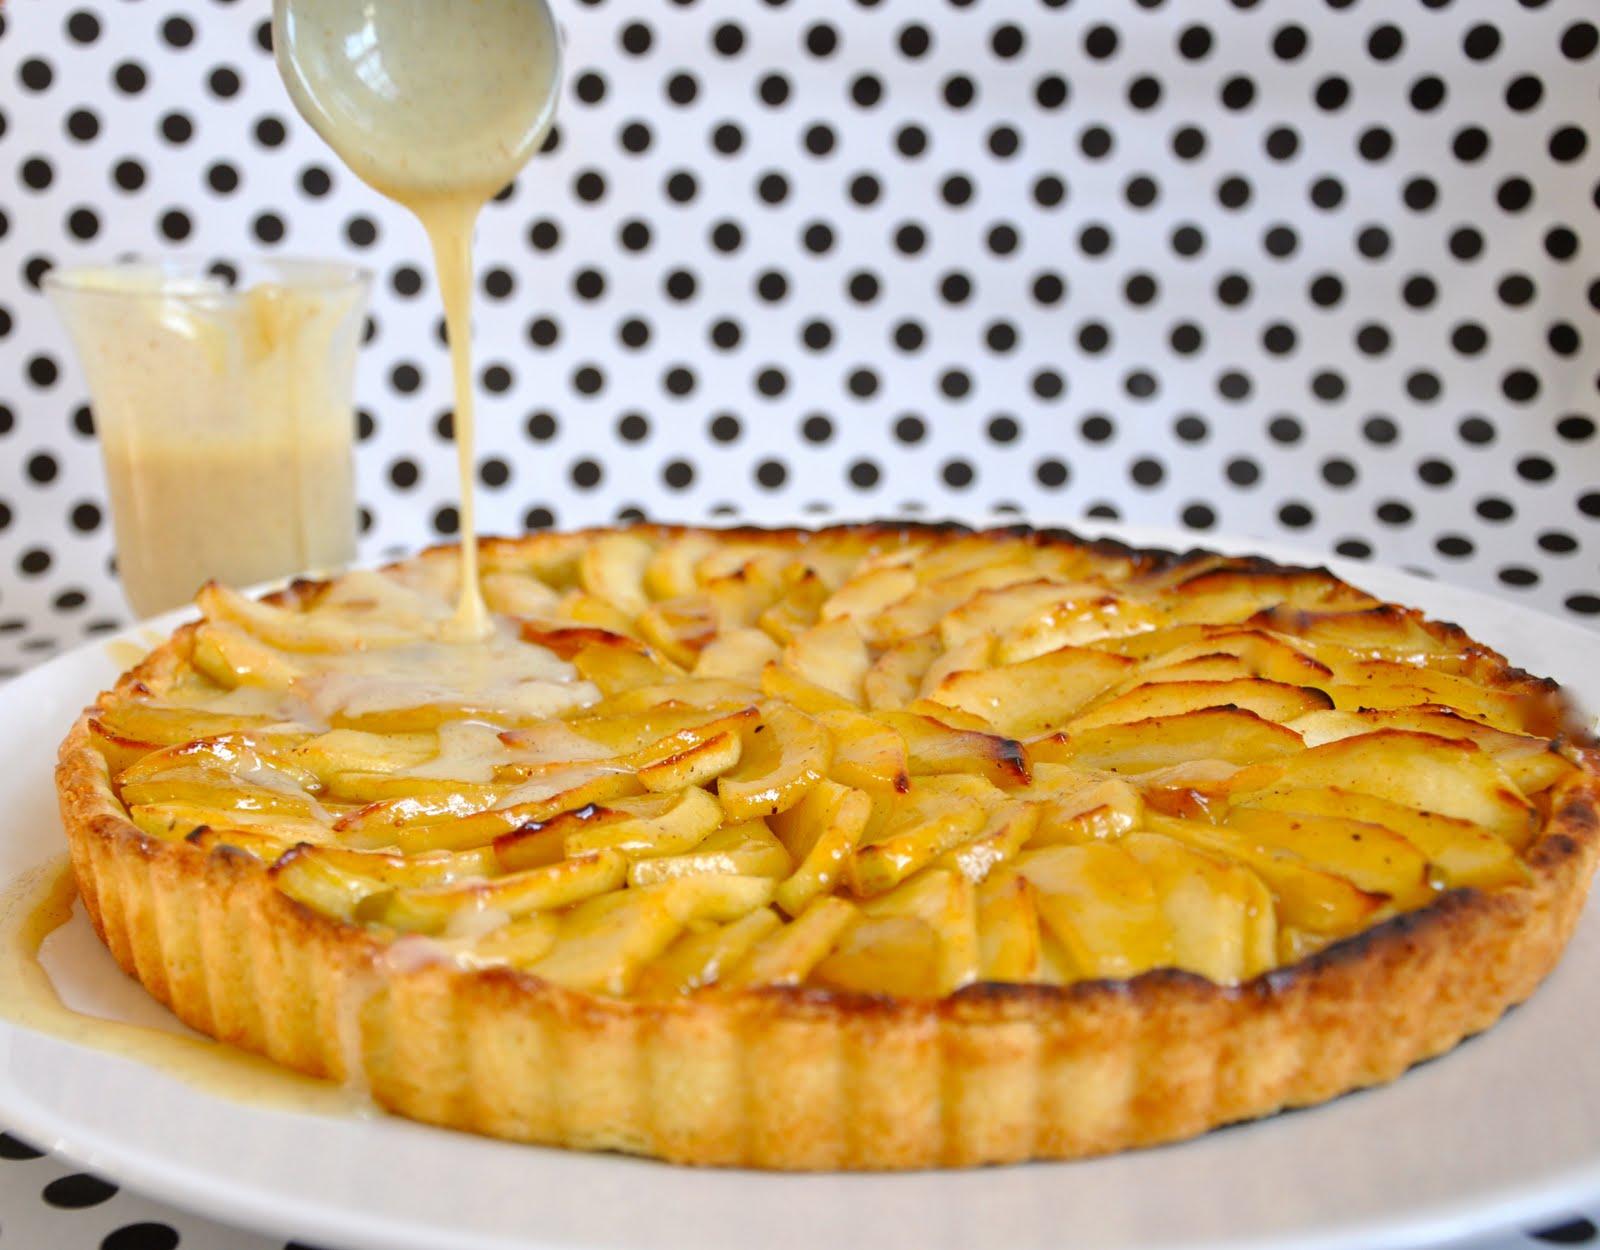 TheFoodClass: French apple tart with vanilla & caramel sauce